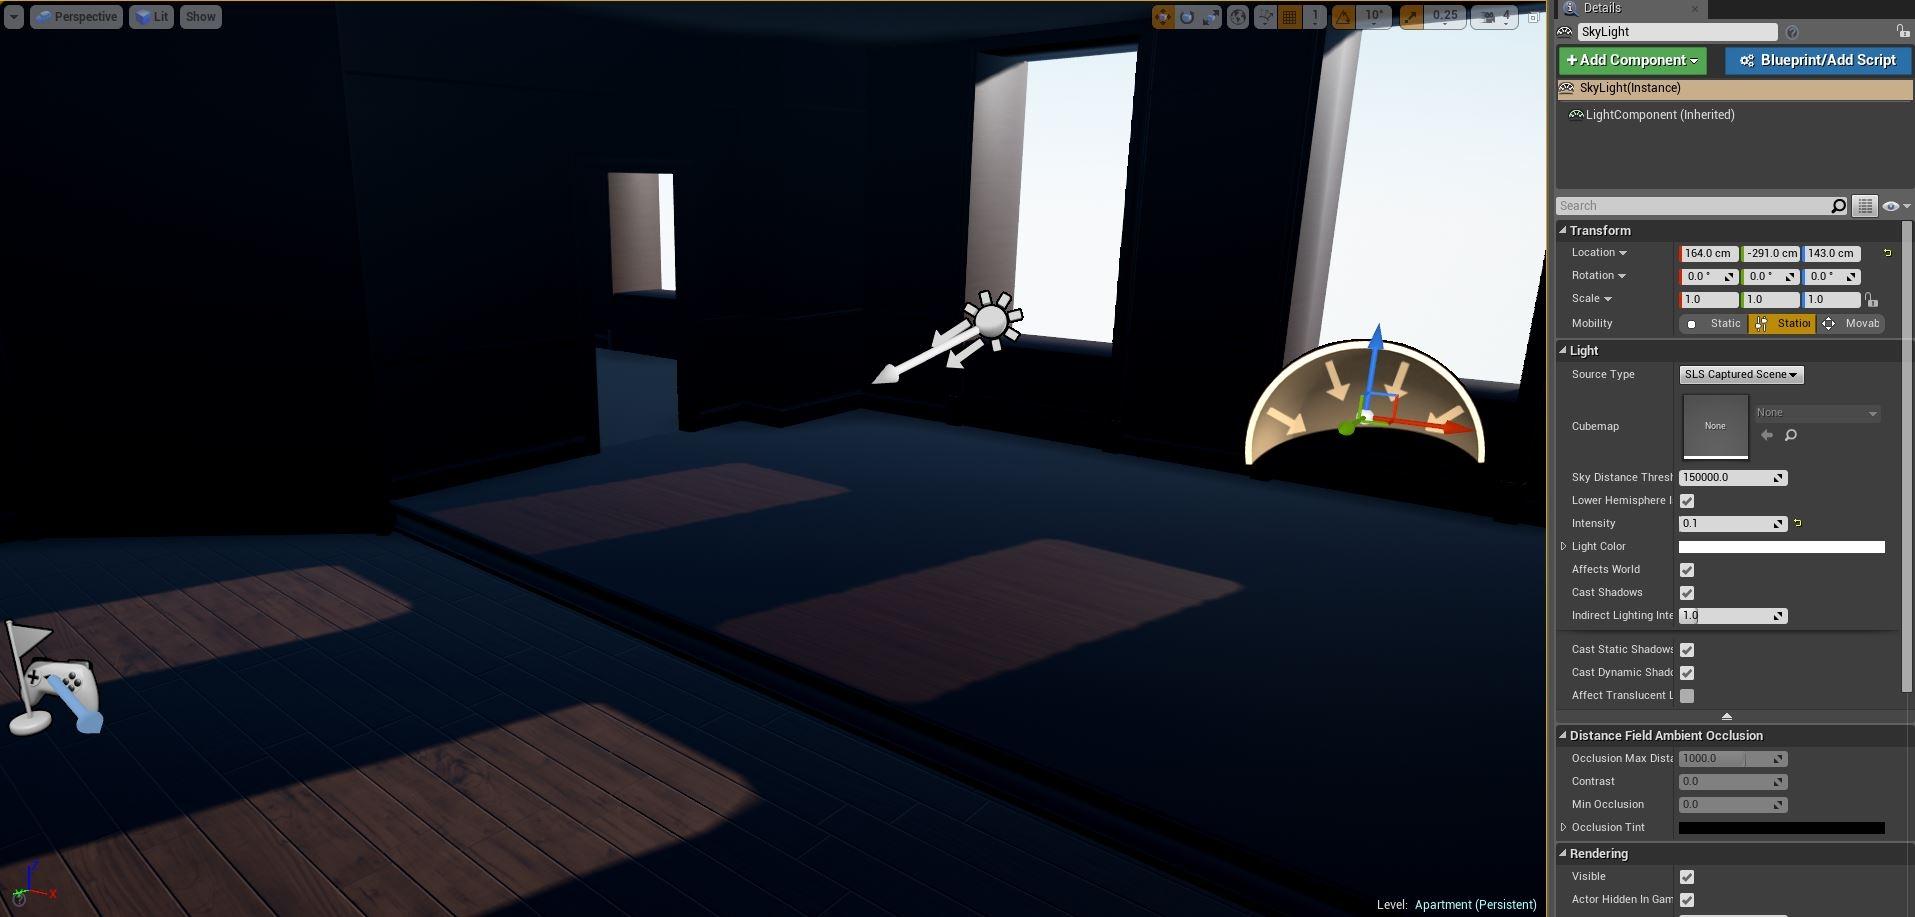 skylight lighting. SKYLIGHT_1. Skylight Lighting A